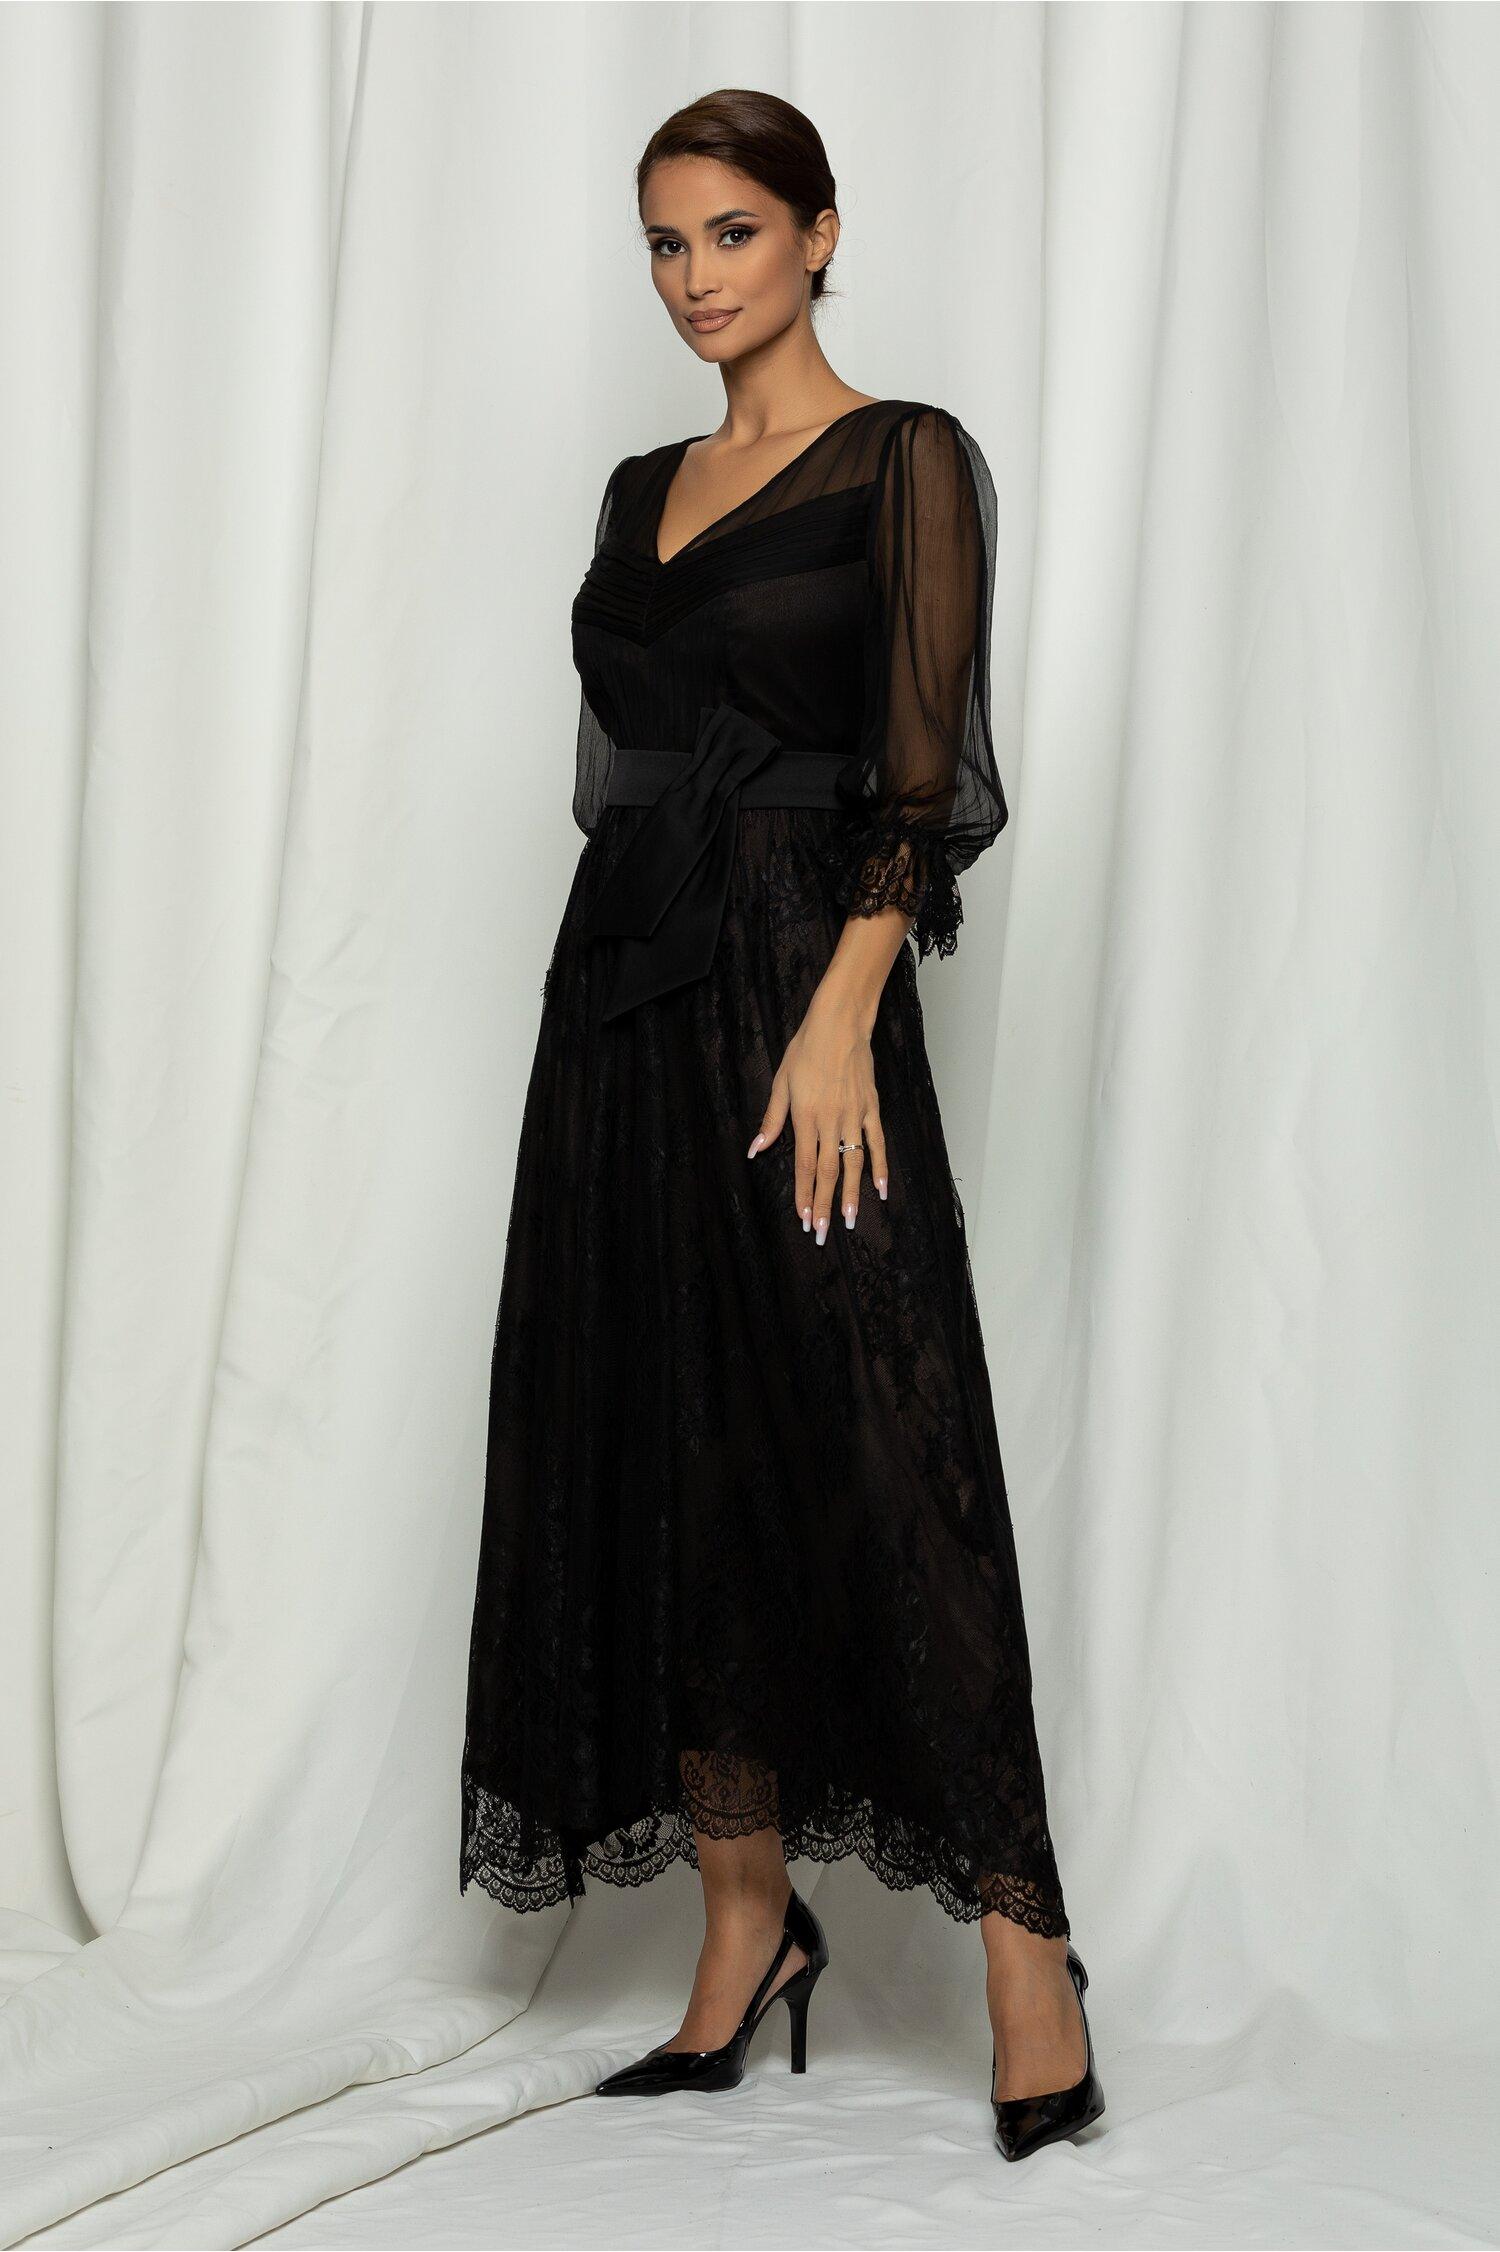 Rochie Leonard Collection neagra cu centura in talie